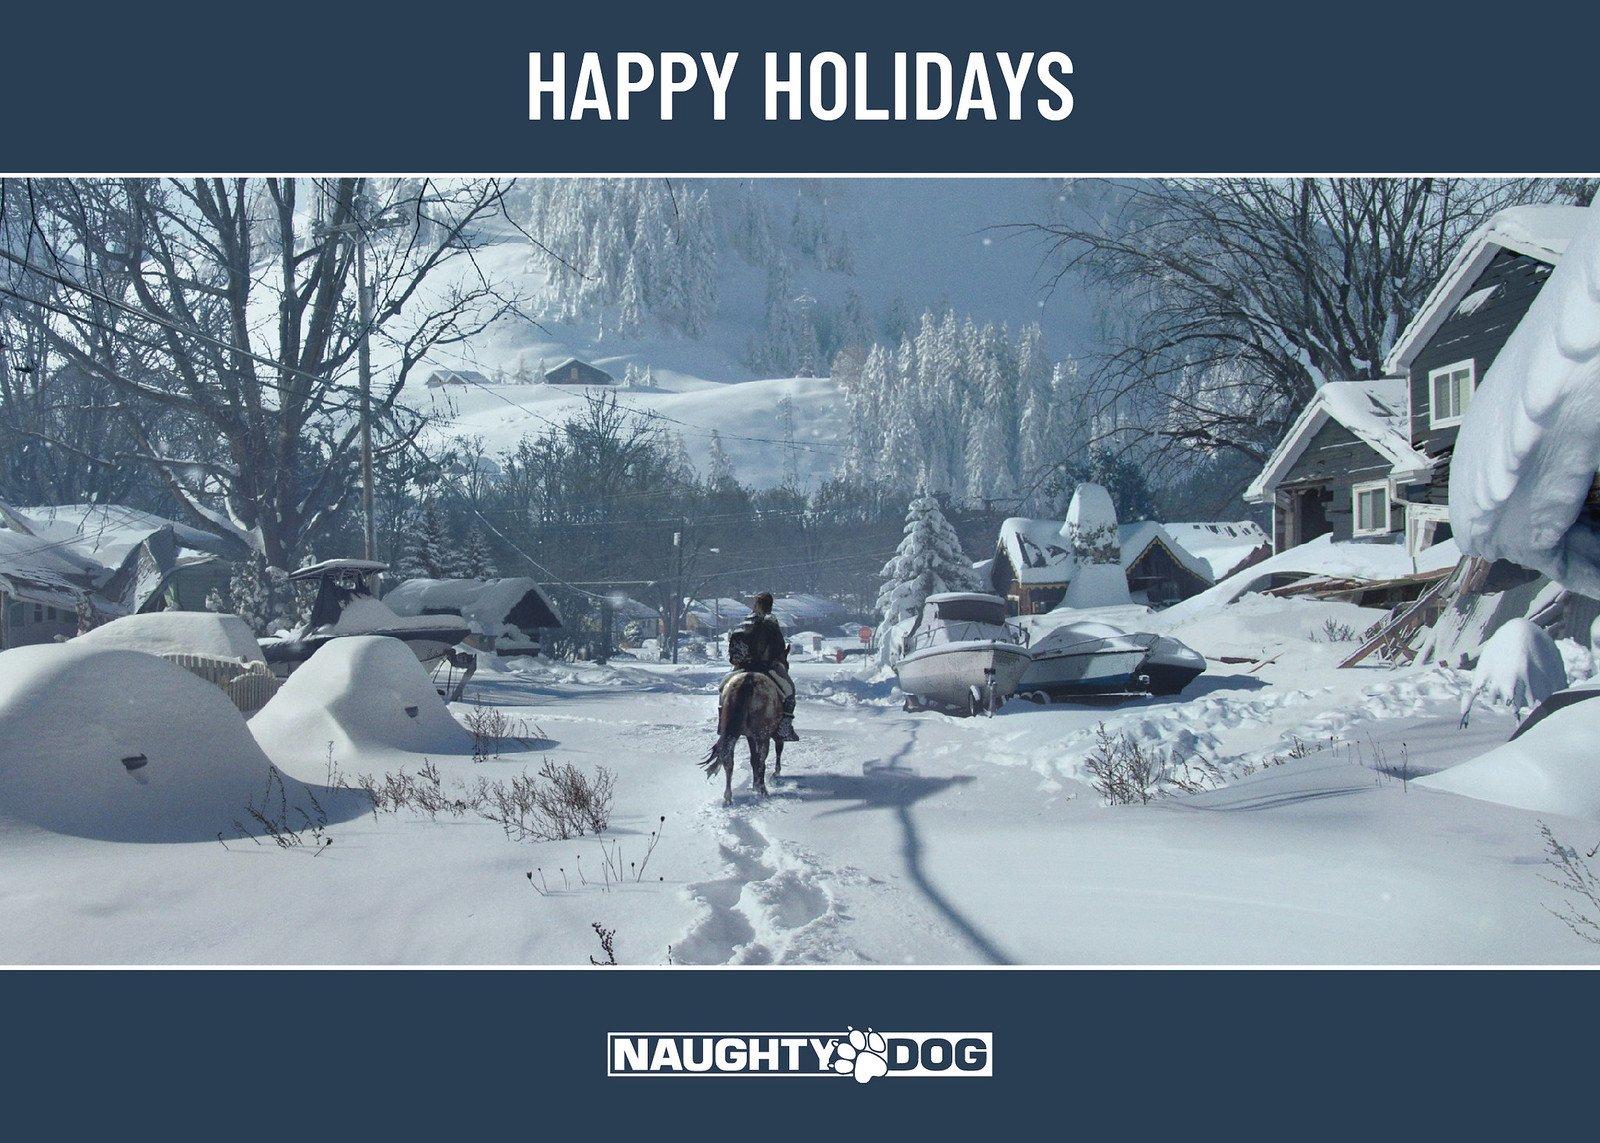 Naughty Dog Happy Holidays Wallpaper